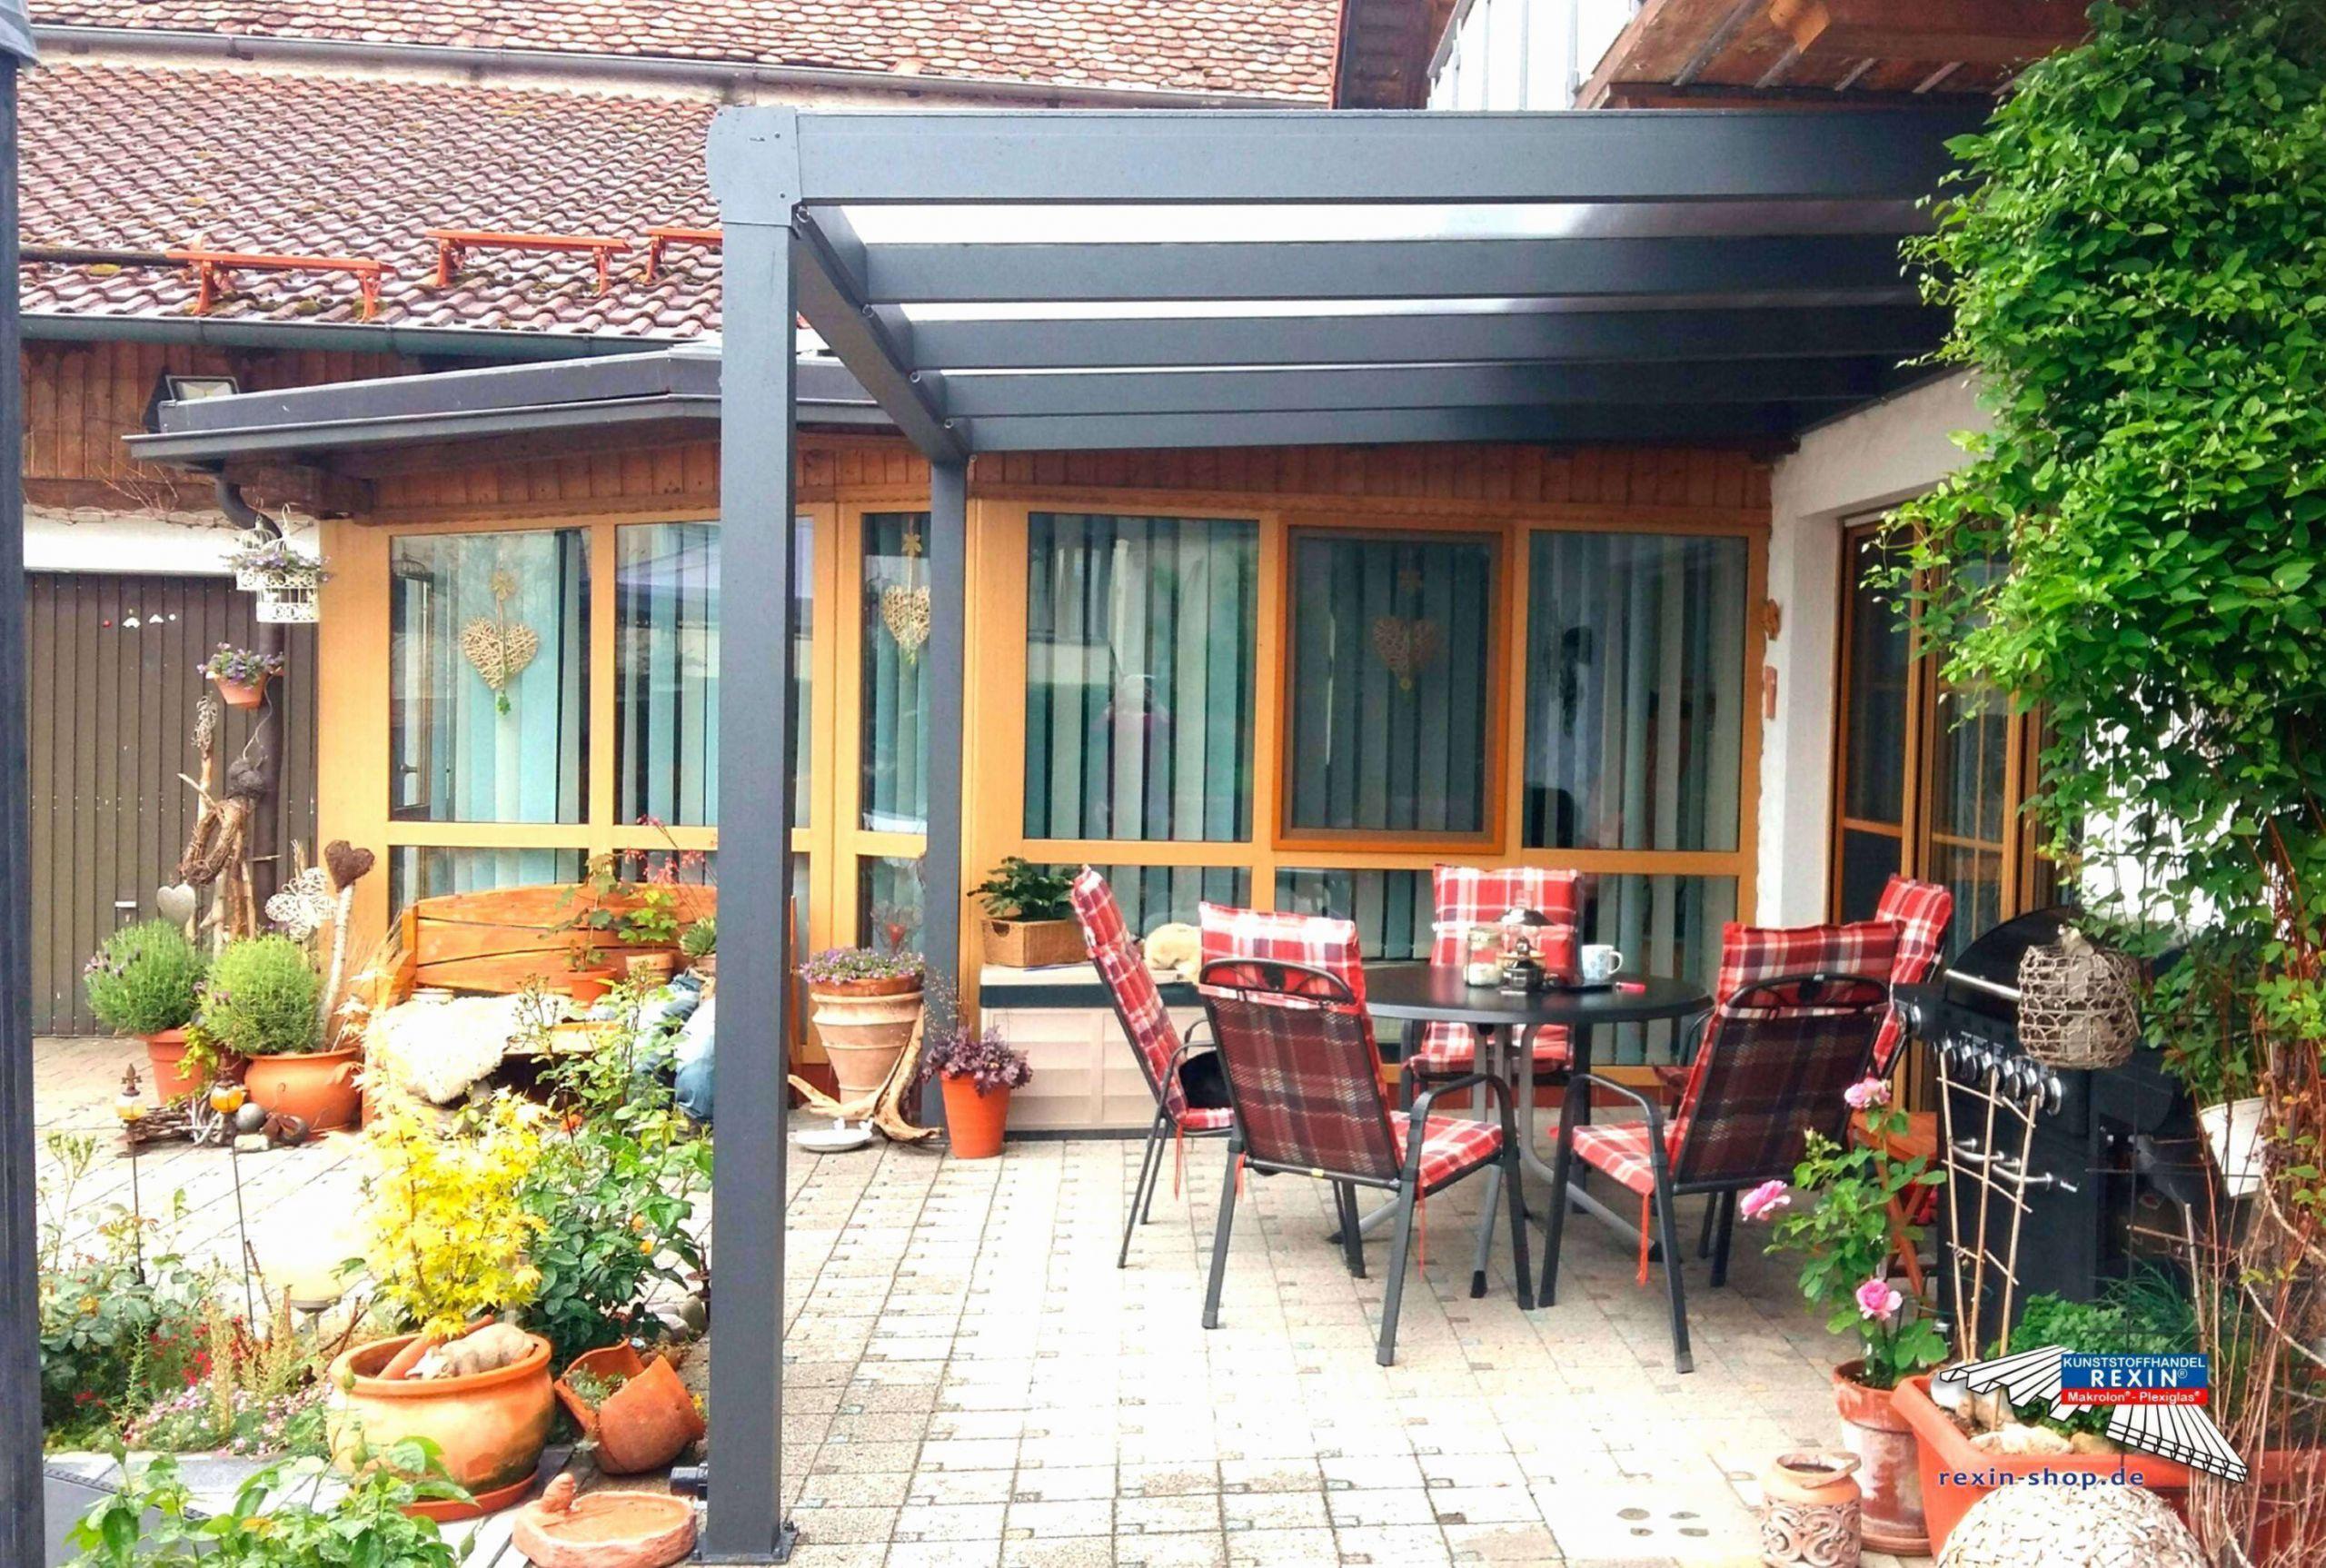 Balkon Deko Schön Deko Garten Selber Machen — Temobardz Home Blog